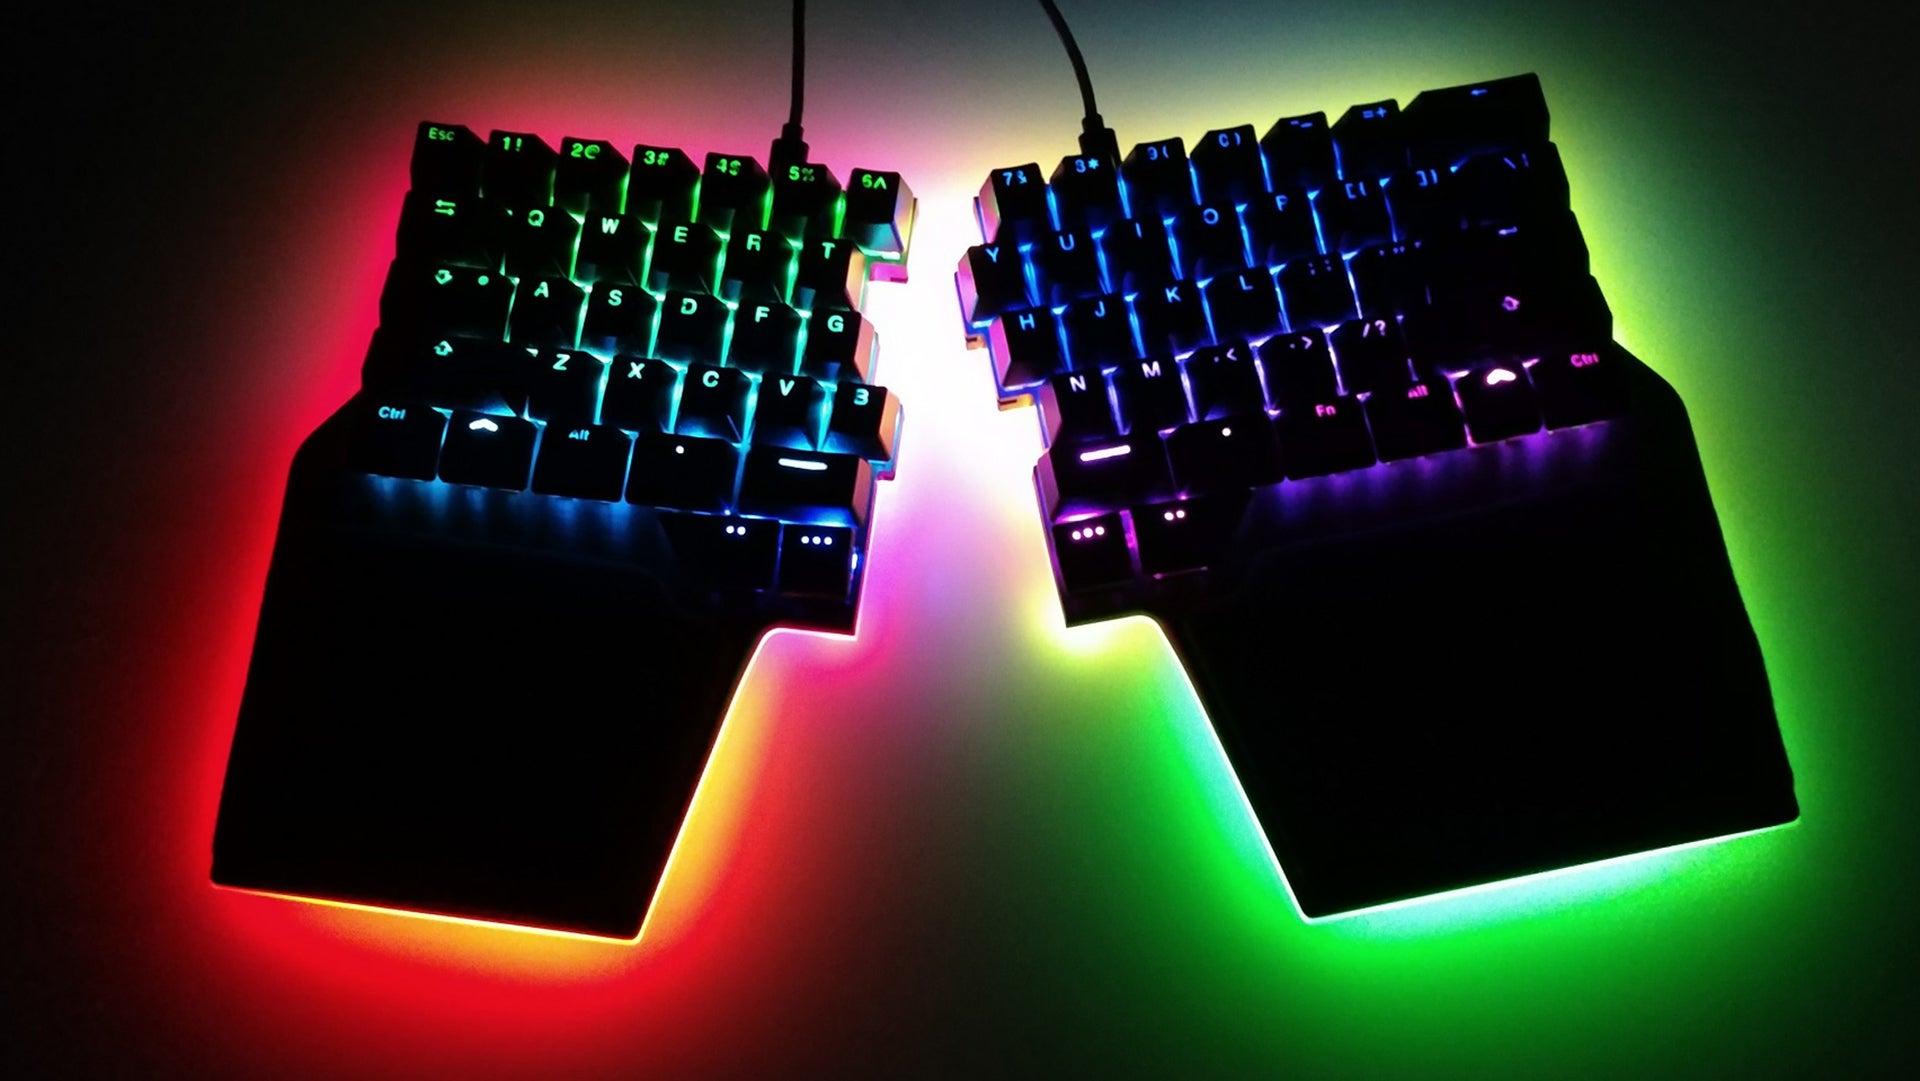 A Split Keyboard Built For Esports